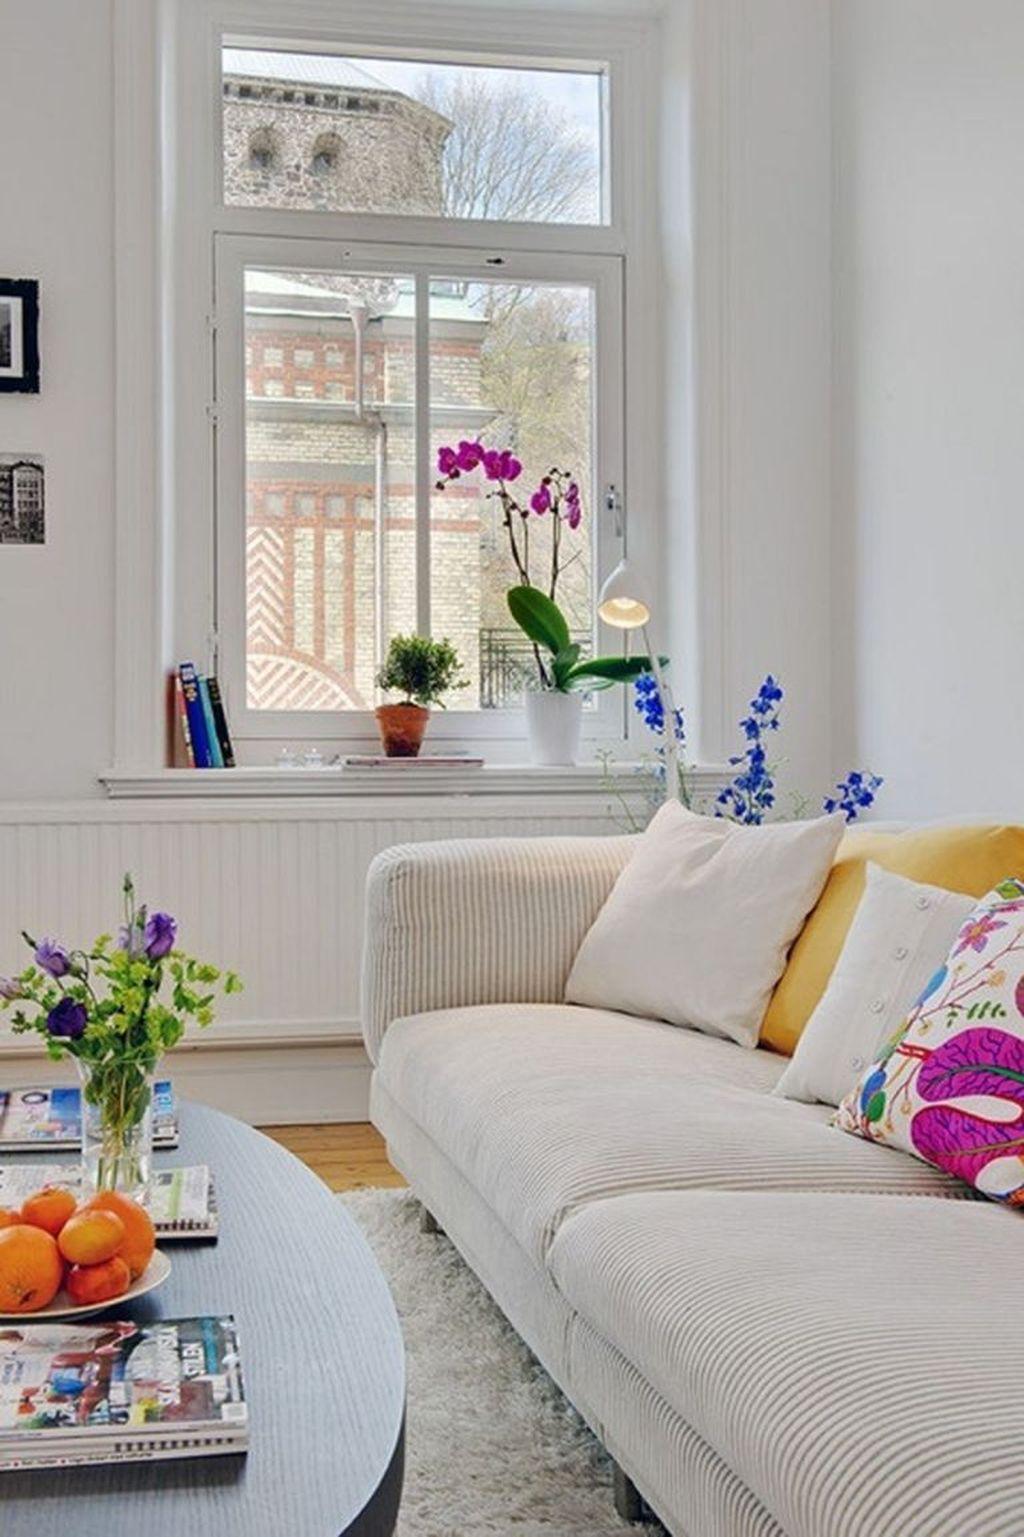 Stunning Apartment Spring Decor Ideas 09